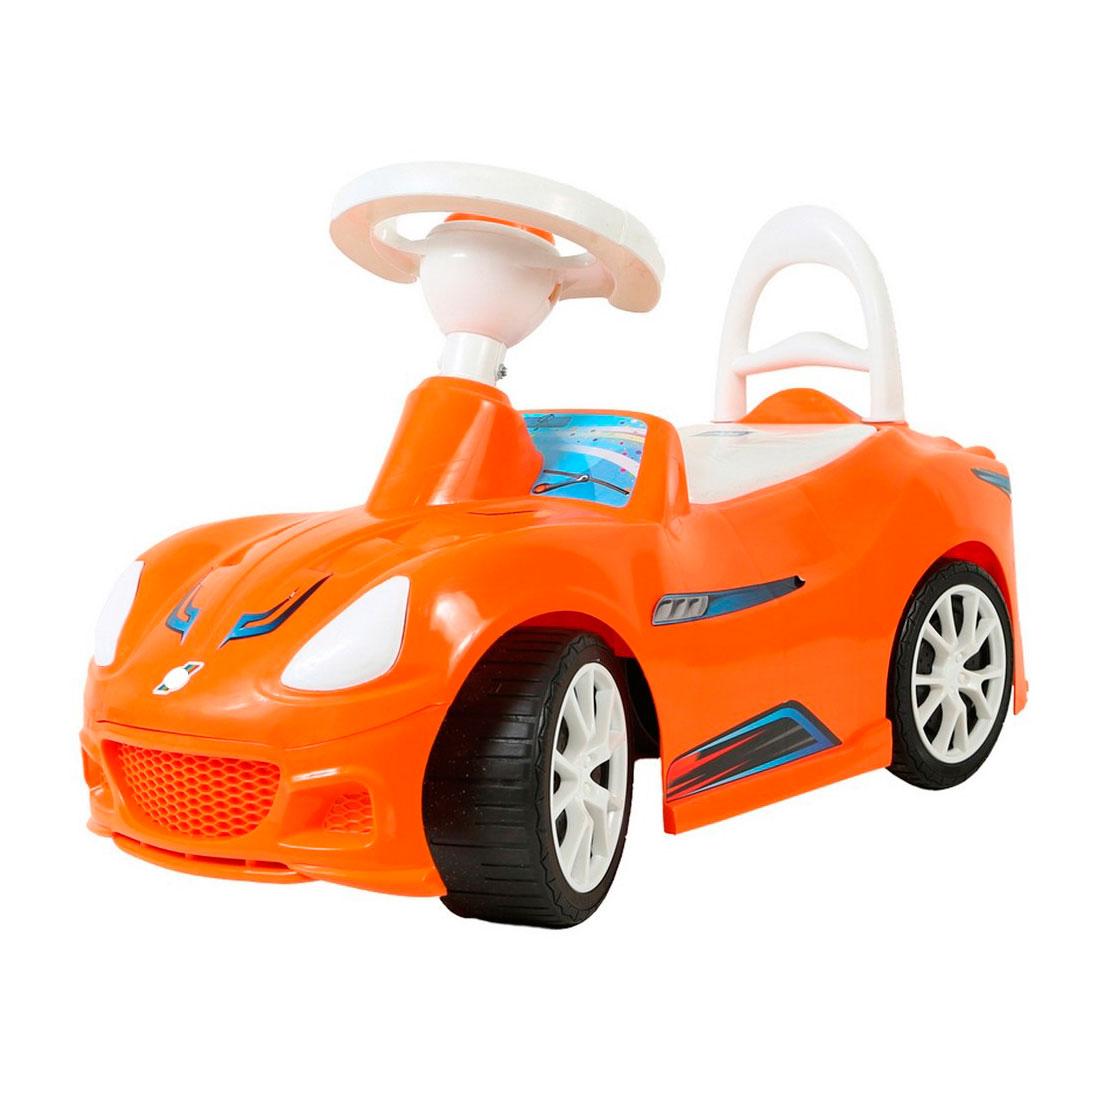 Каталка RT Спорткар ОР160 Оранжевая